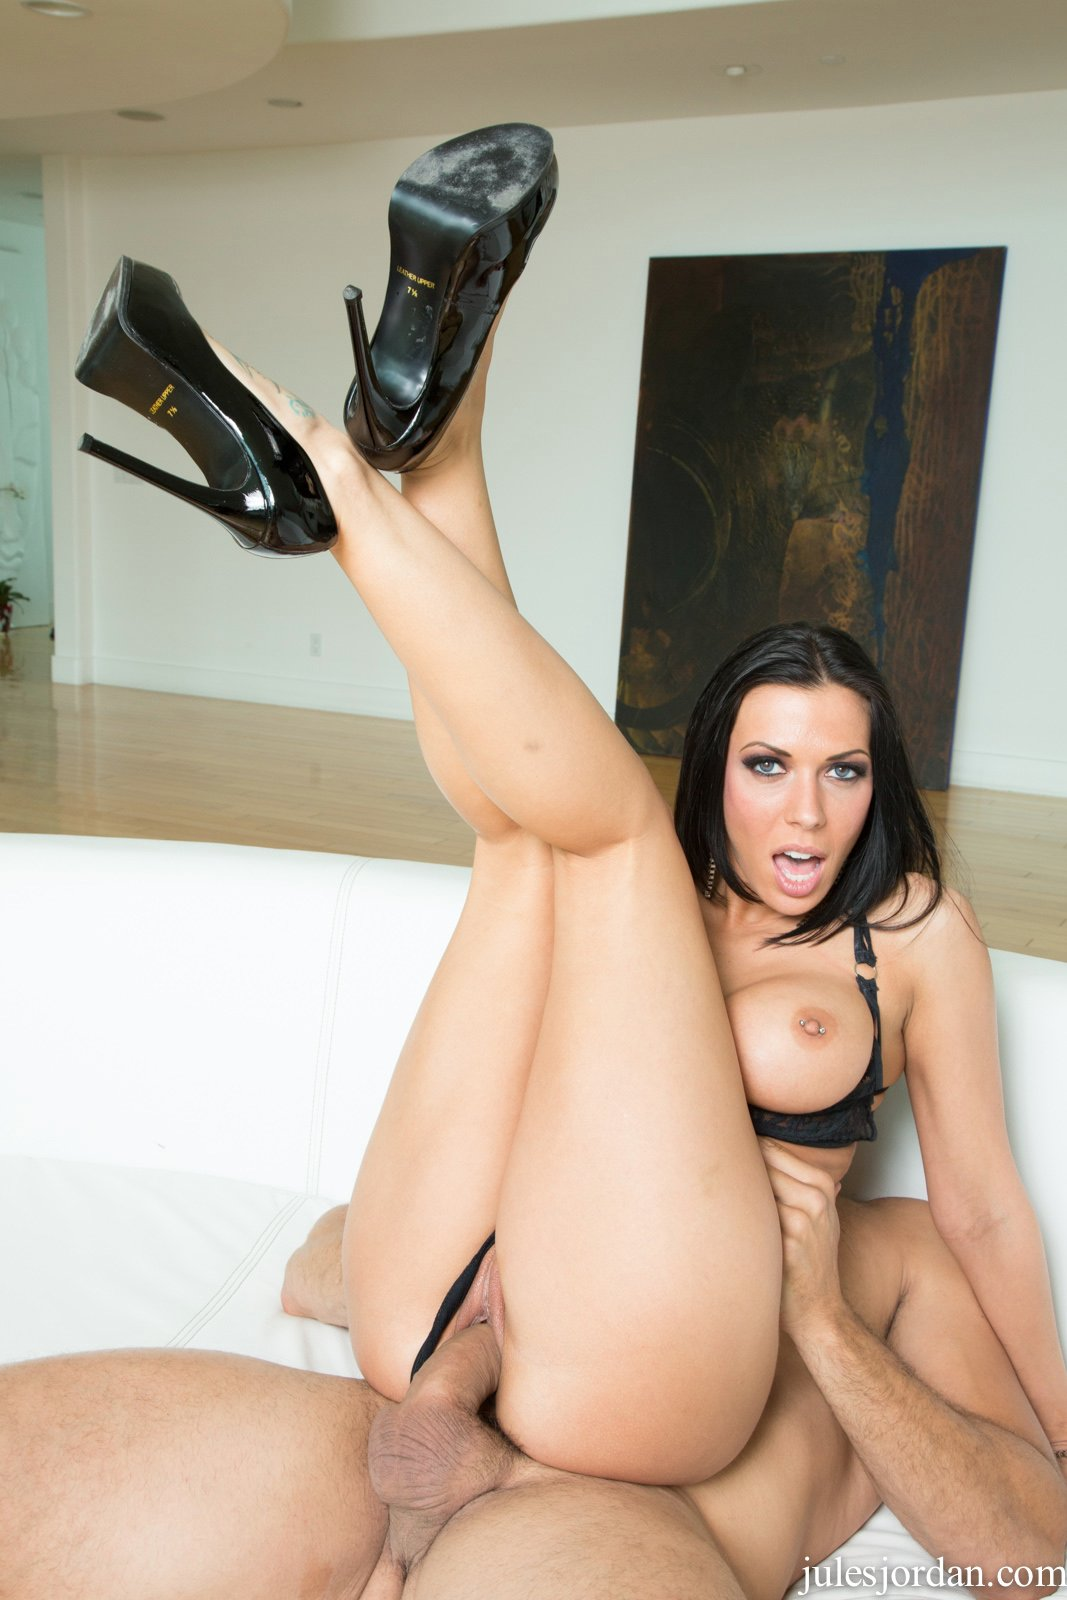 Agree, remarkable Sonali xxx sex nuda image